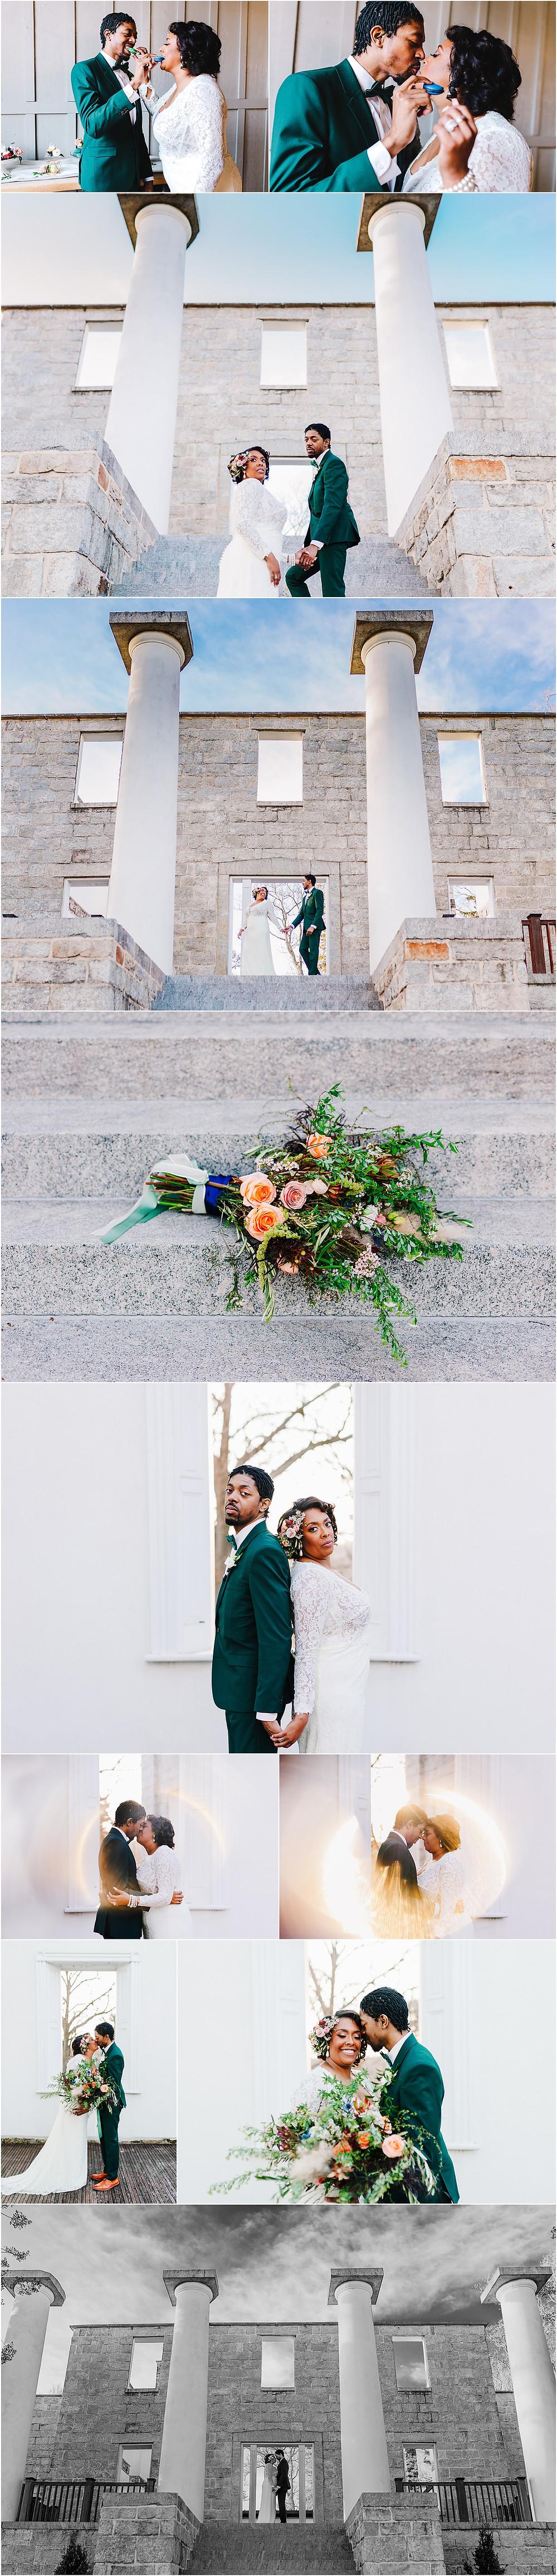 Patapsco Female Institue Wedding Photographer. Baltimore Elopement Photographer